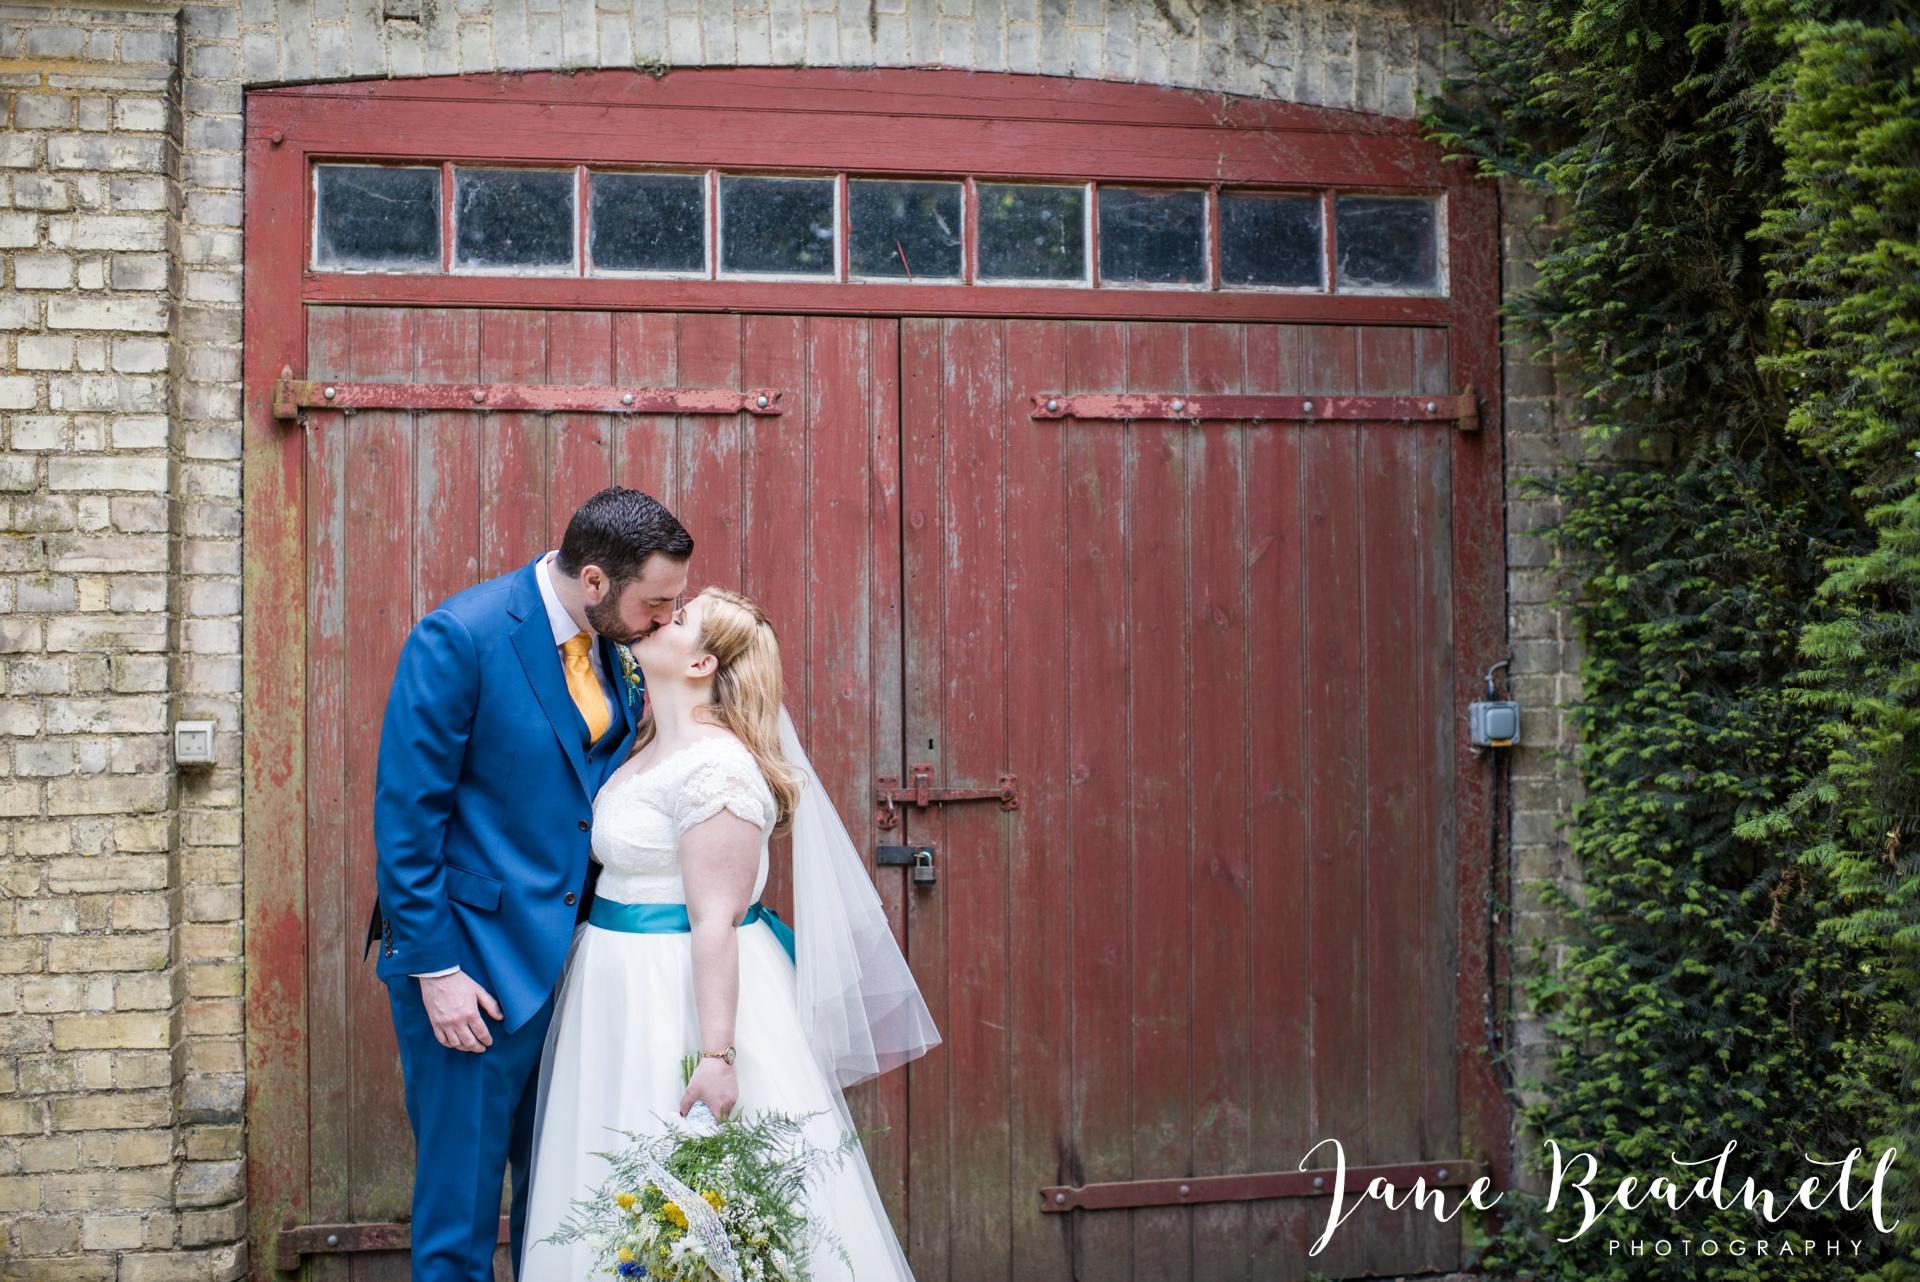 South Farm Wedding photography Hertfordshire by Jane Beadnell Photography fine art wedding photographer_0107